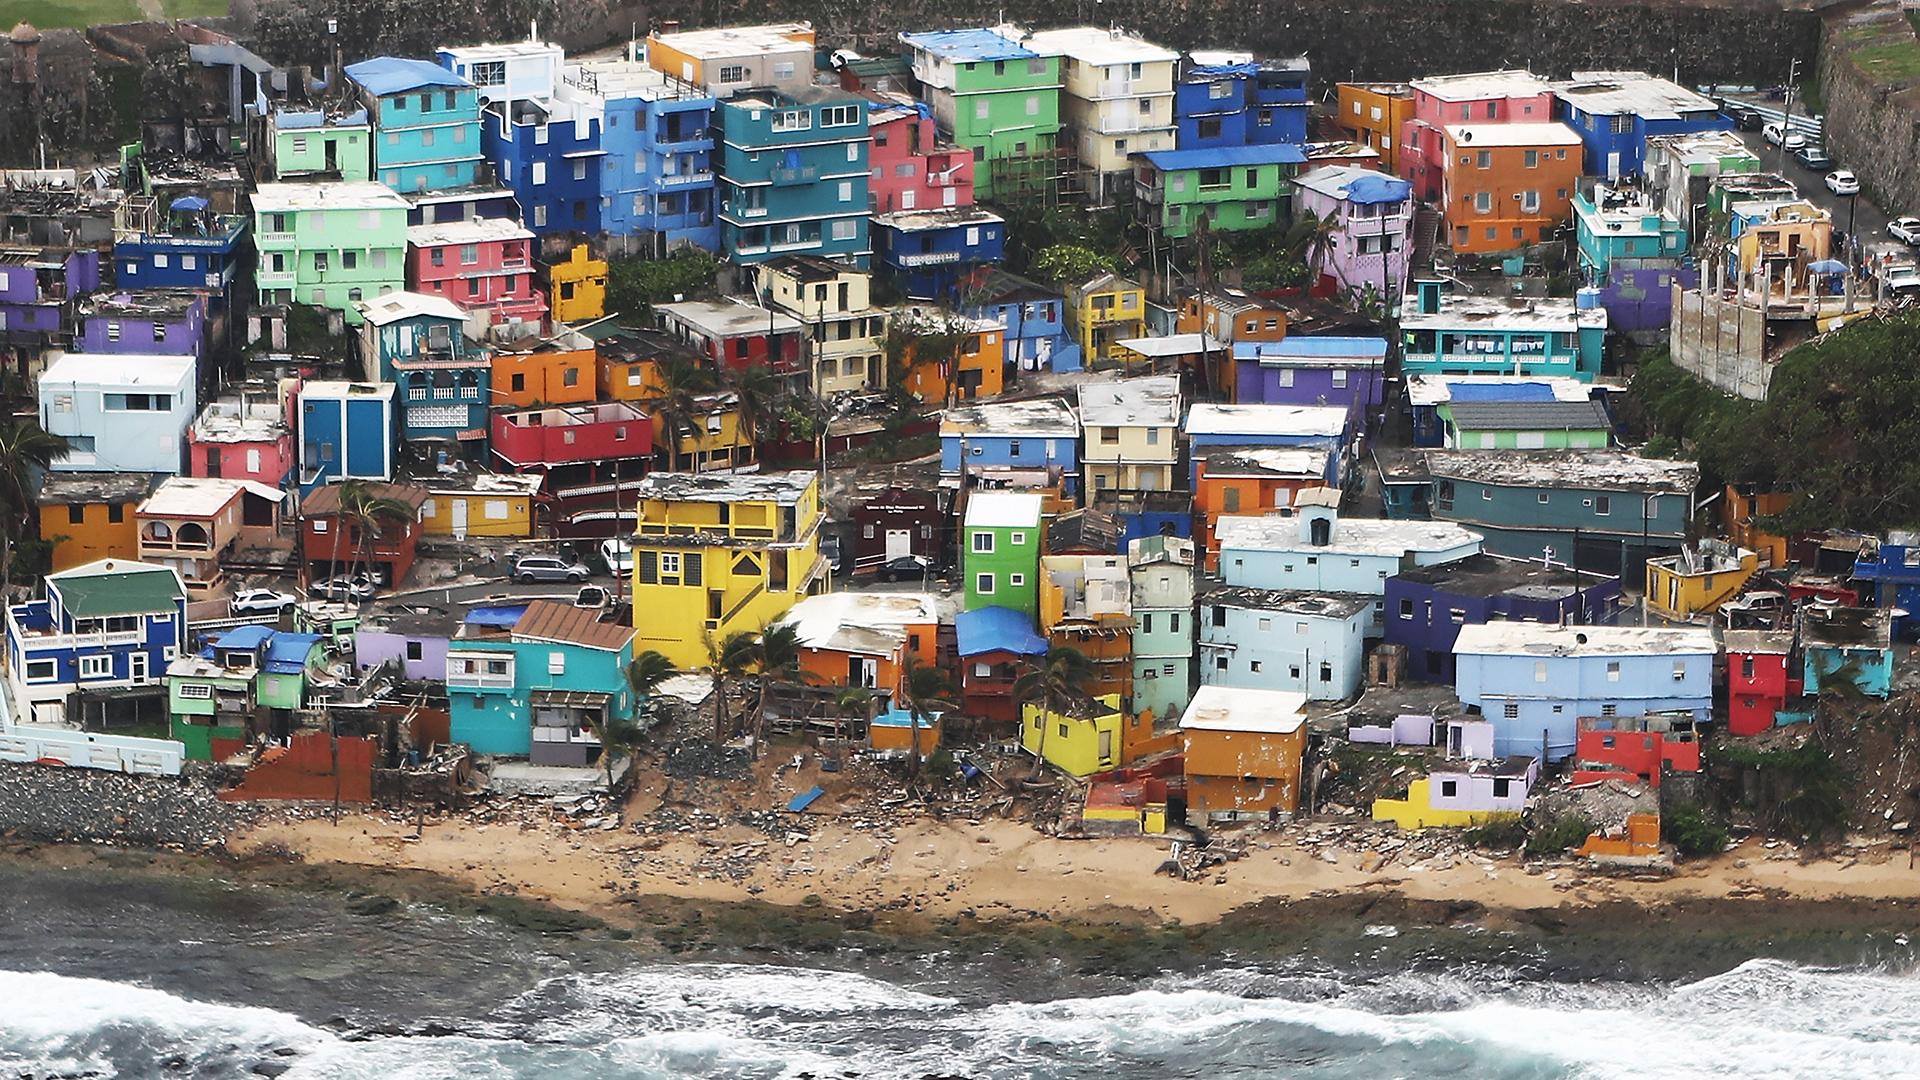 La Perla Puerto Rico after Hurricane Maria-159532.jpg89618108